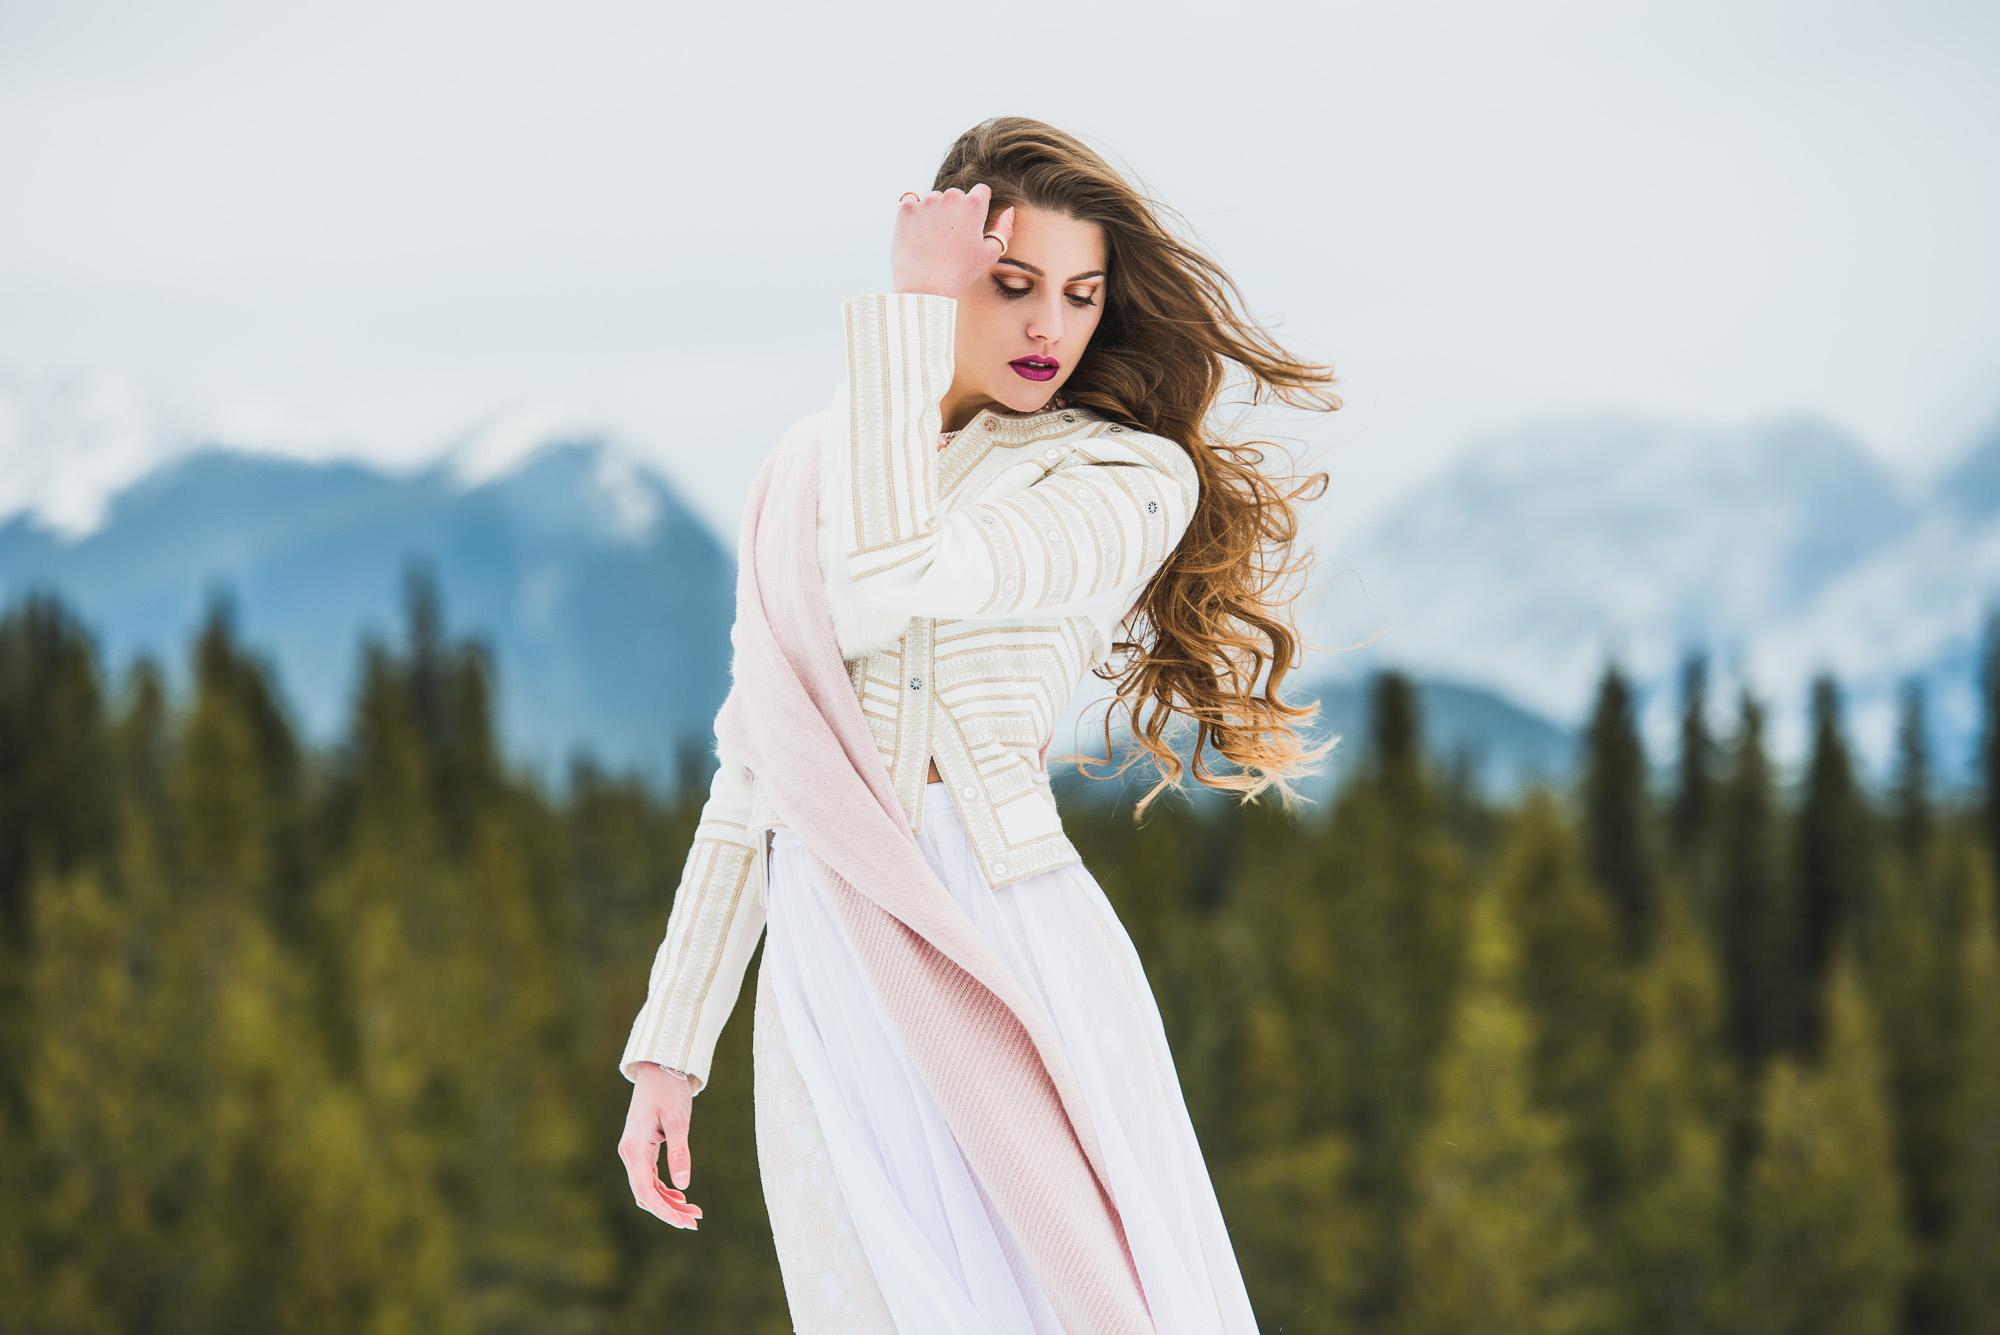 Kananaskis-Winter-Fashion -007.jpg